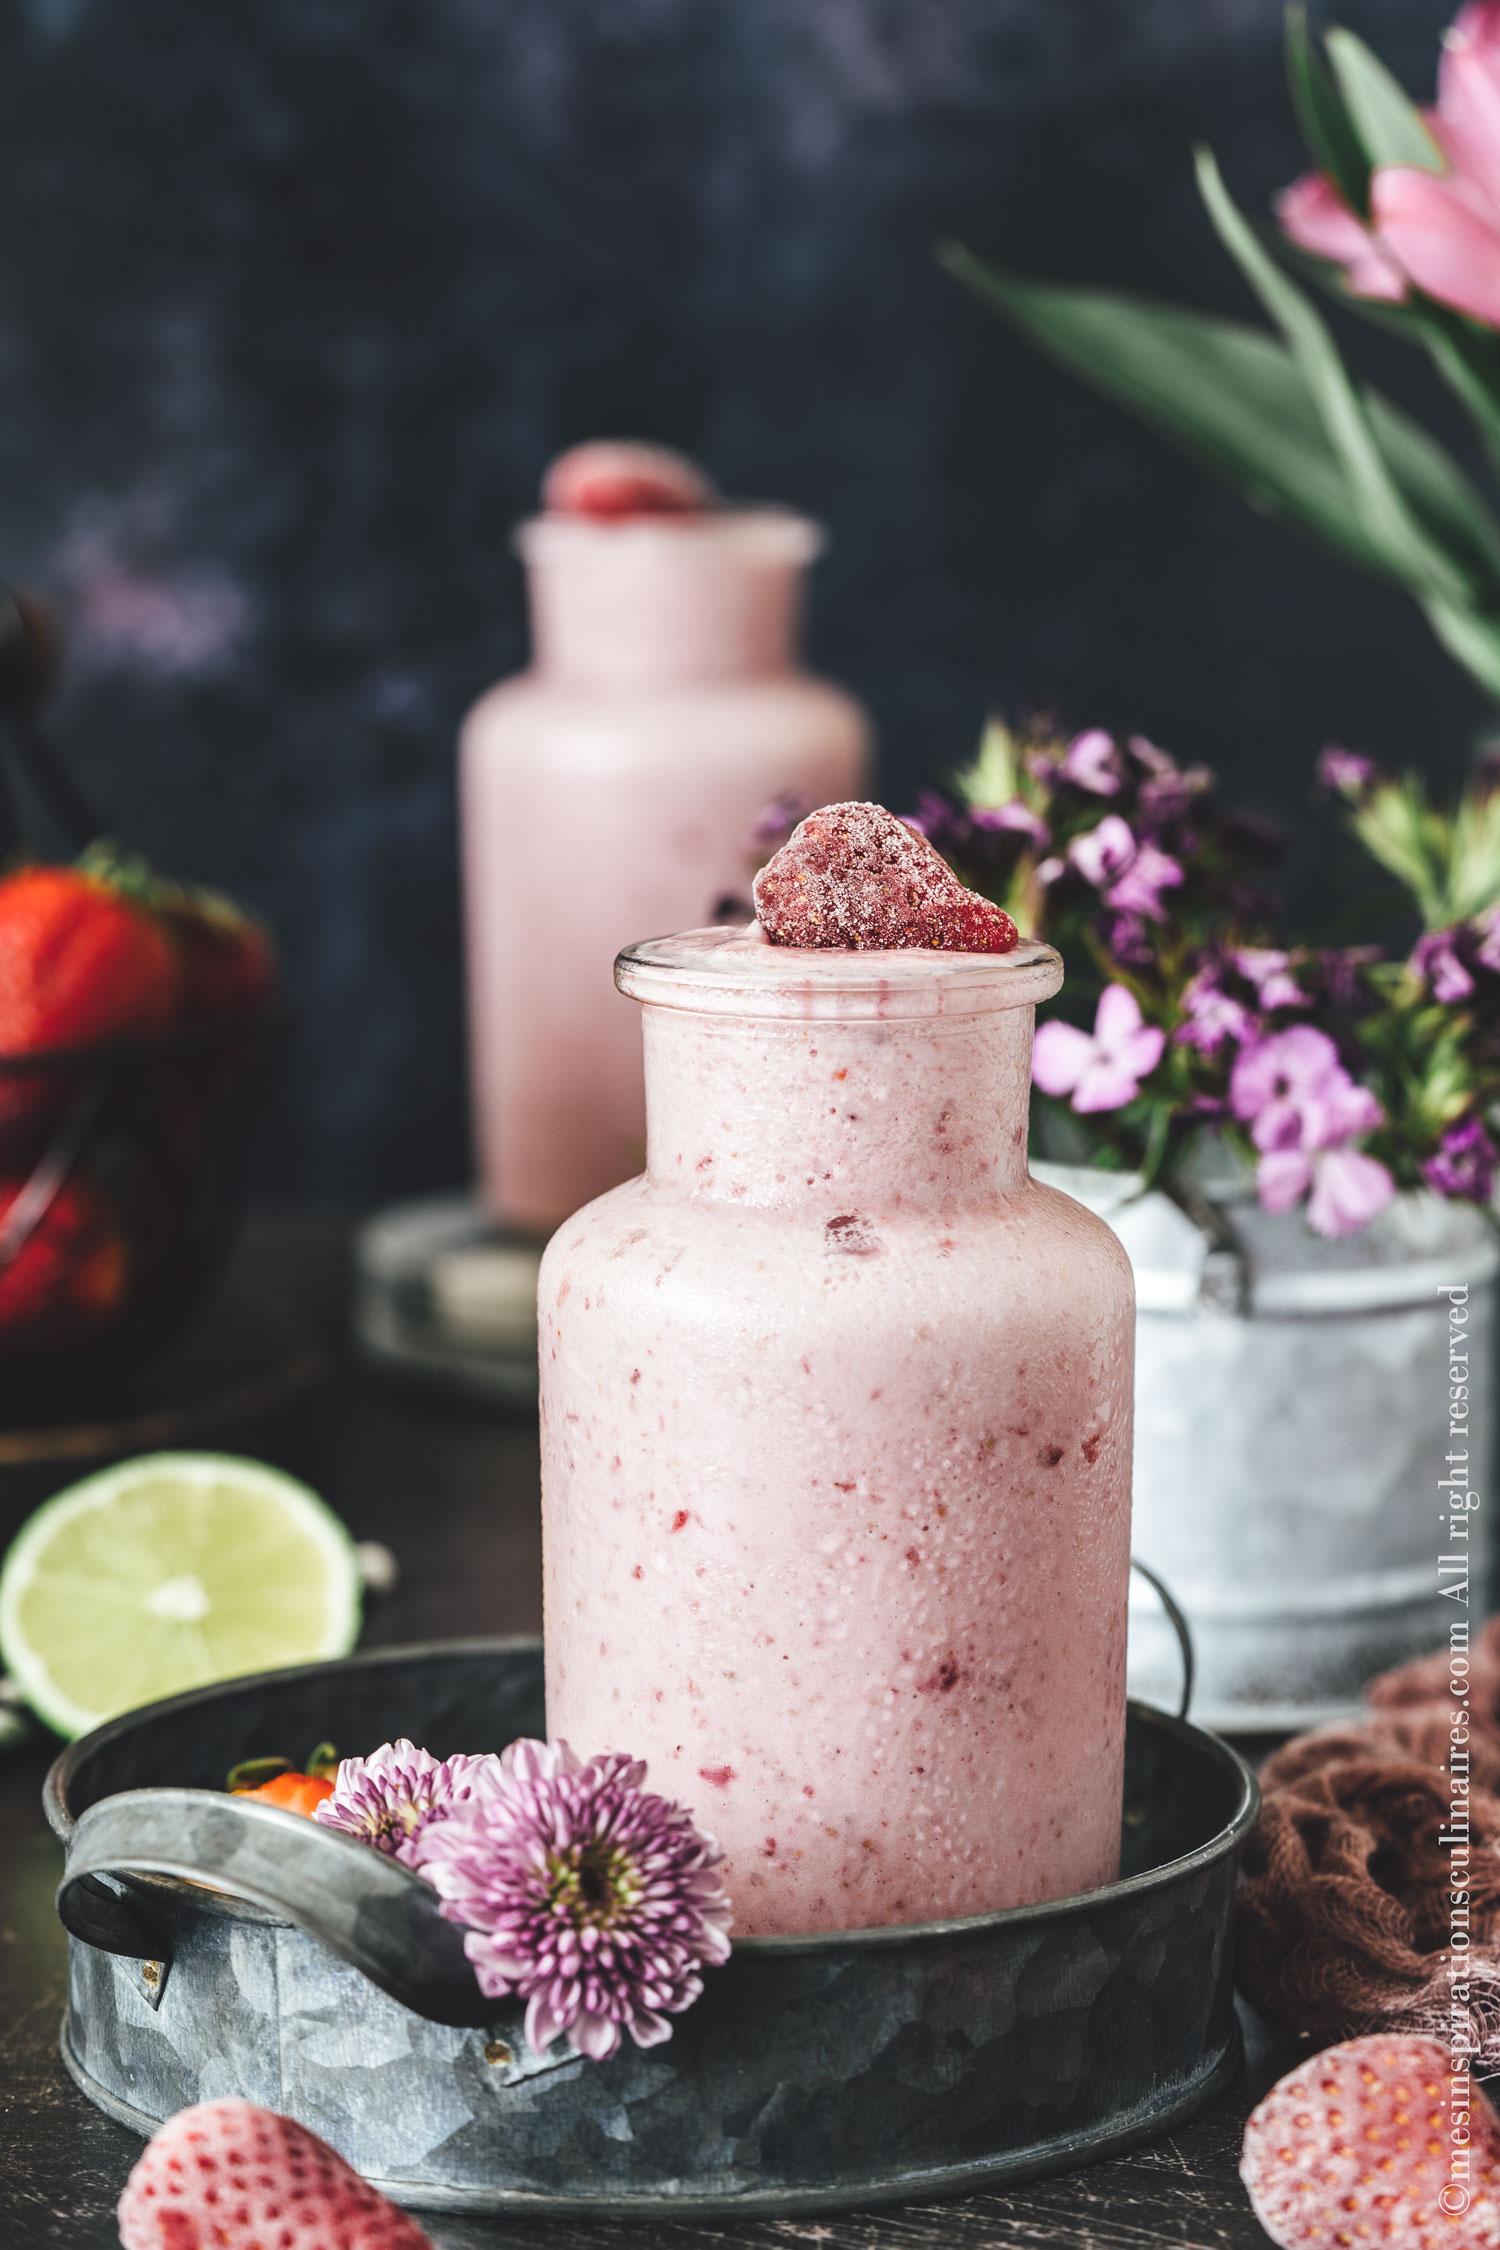 Smoothie fraises surgelees rhubarbe, recette facile